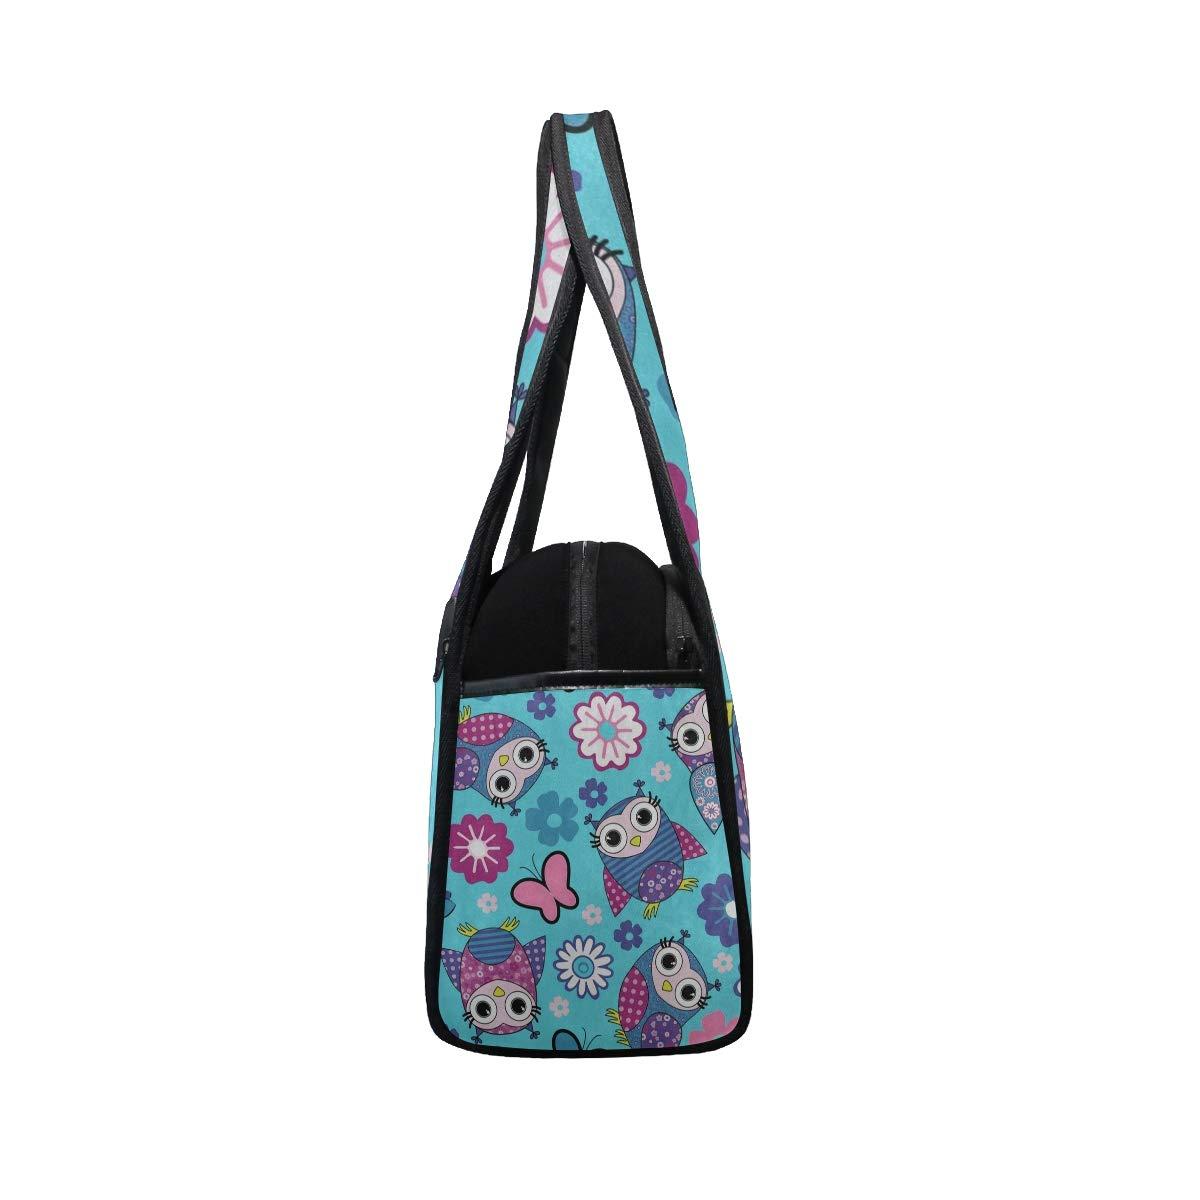 Gym Bag Cute Animal Owl Floral Flower Butterfly Women Yoga Canvas Duffel Bag Crossbody Tennis Racket Tote Travel Bags